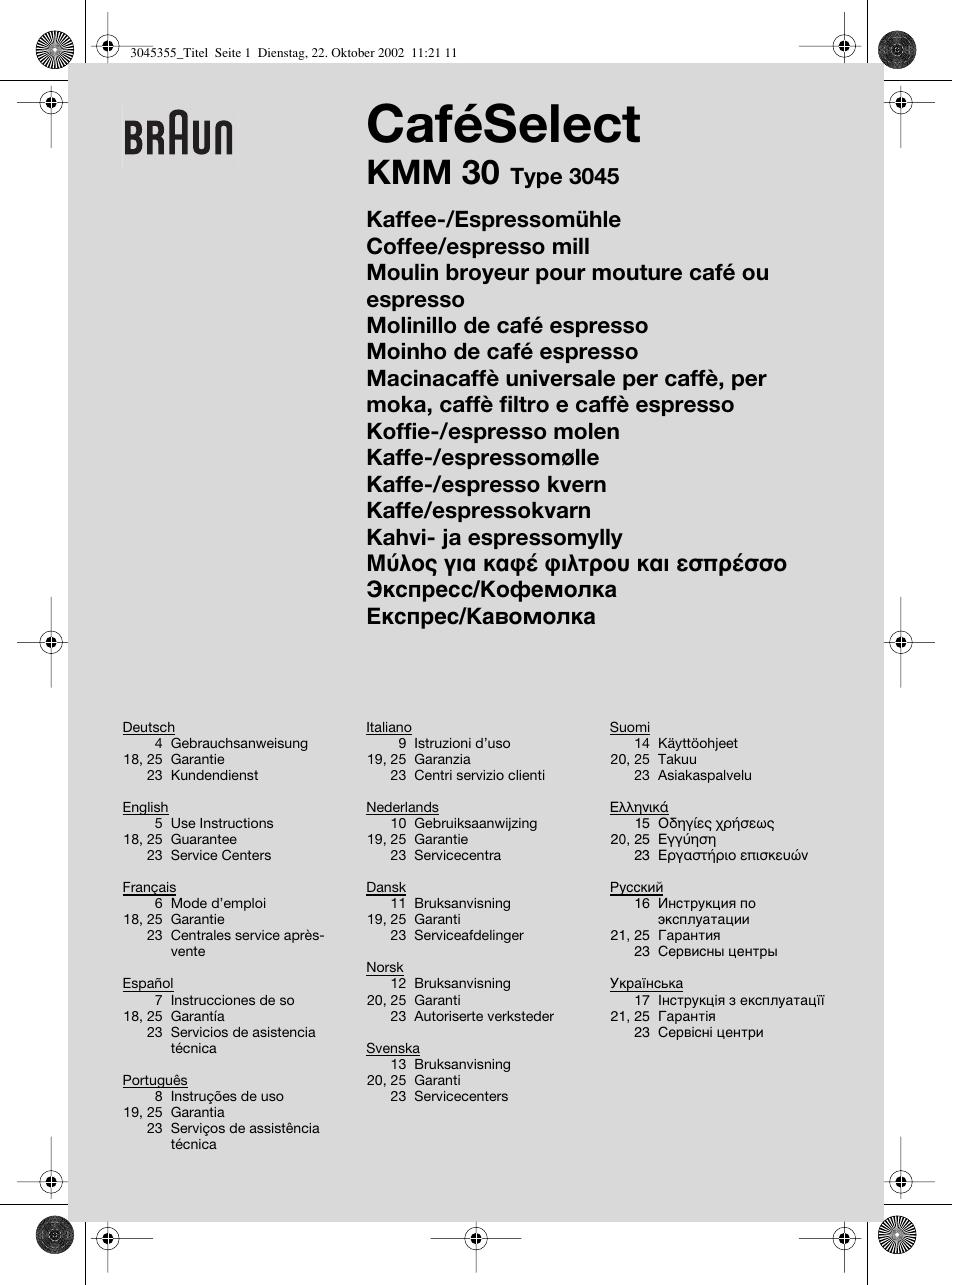 manual joomla 15 espanol